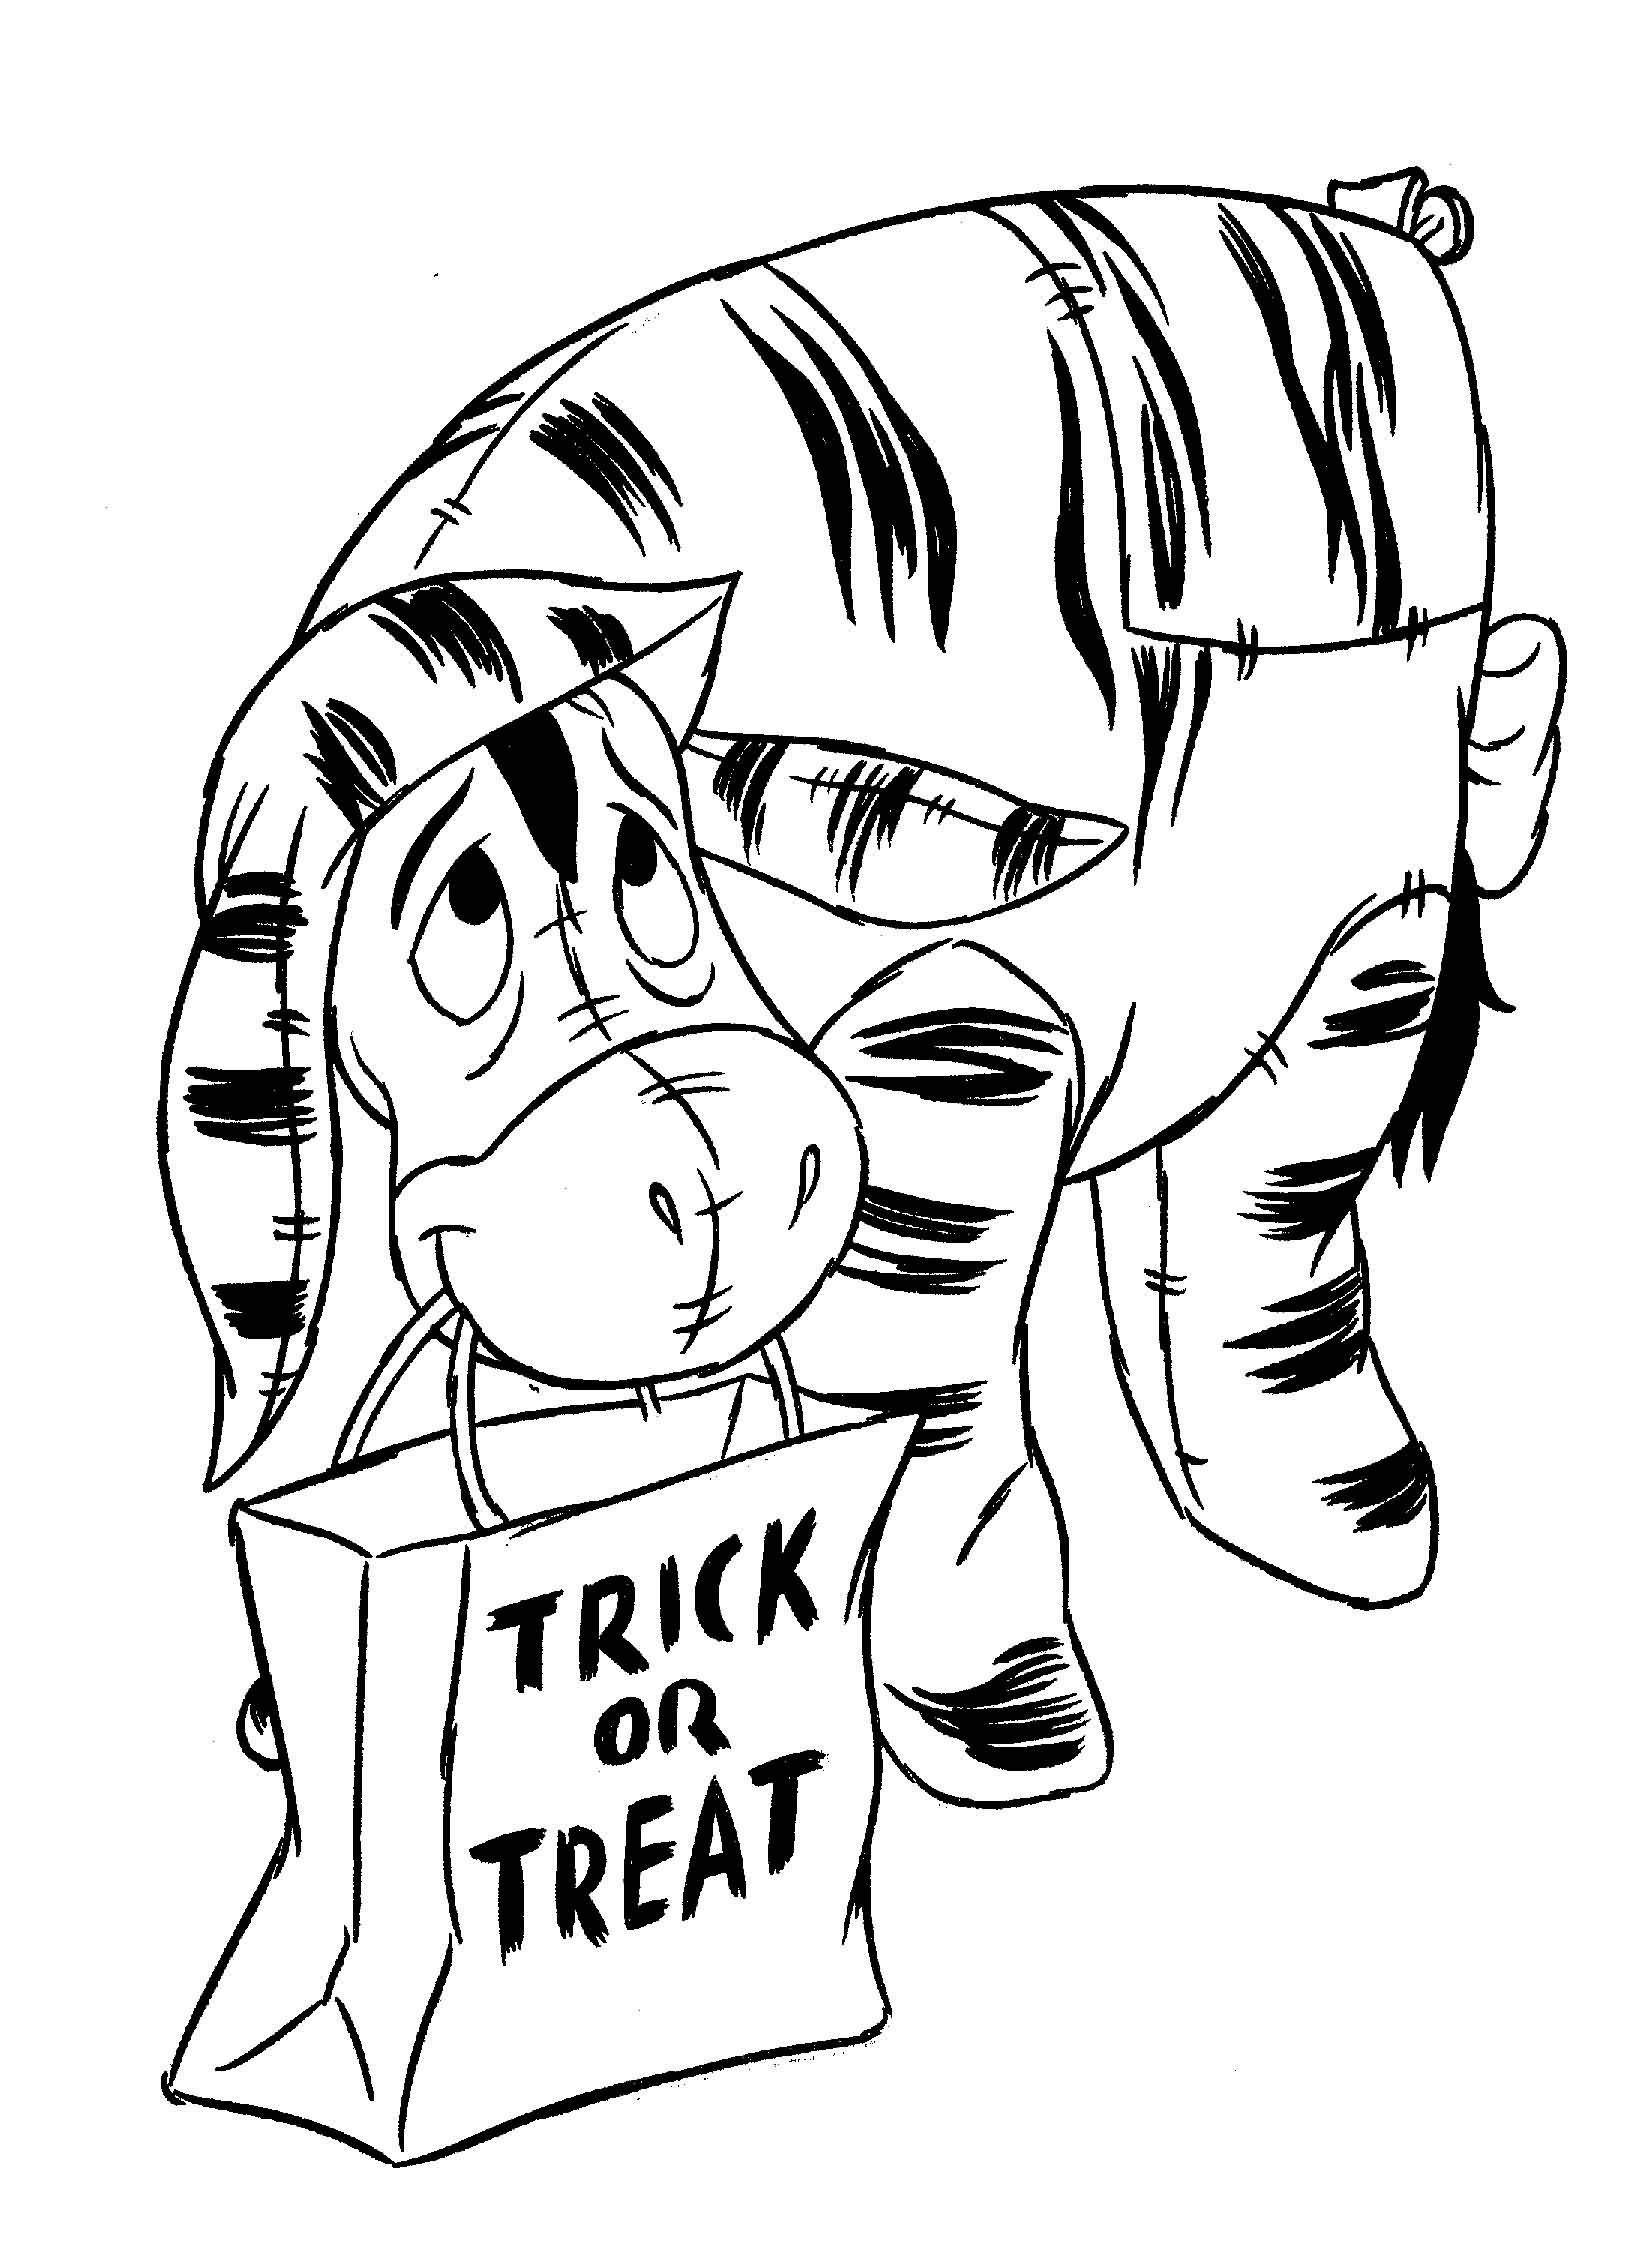 Thema Kleurplaten Halloween.Kids N Fun 19 Kleurplaten Van Halloween